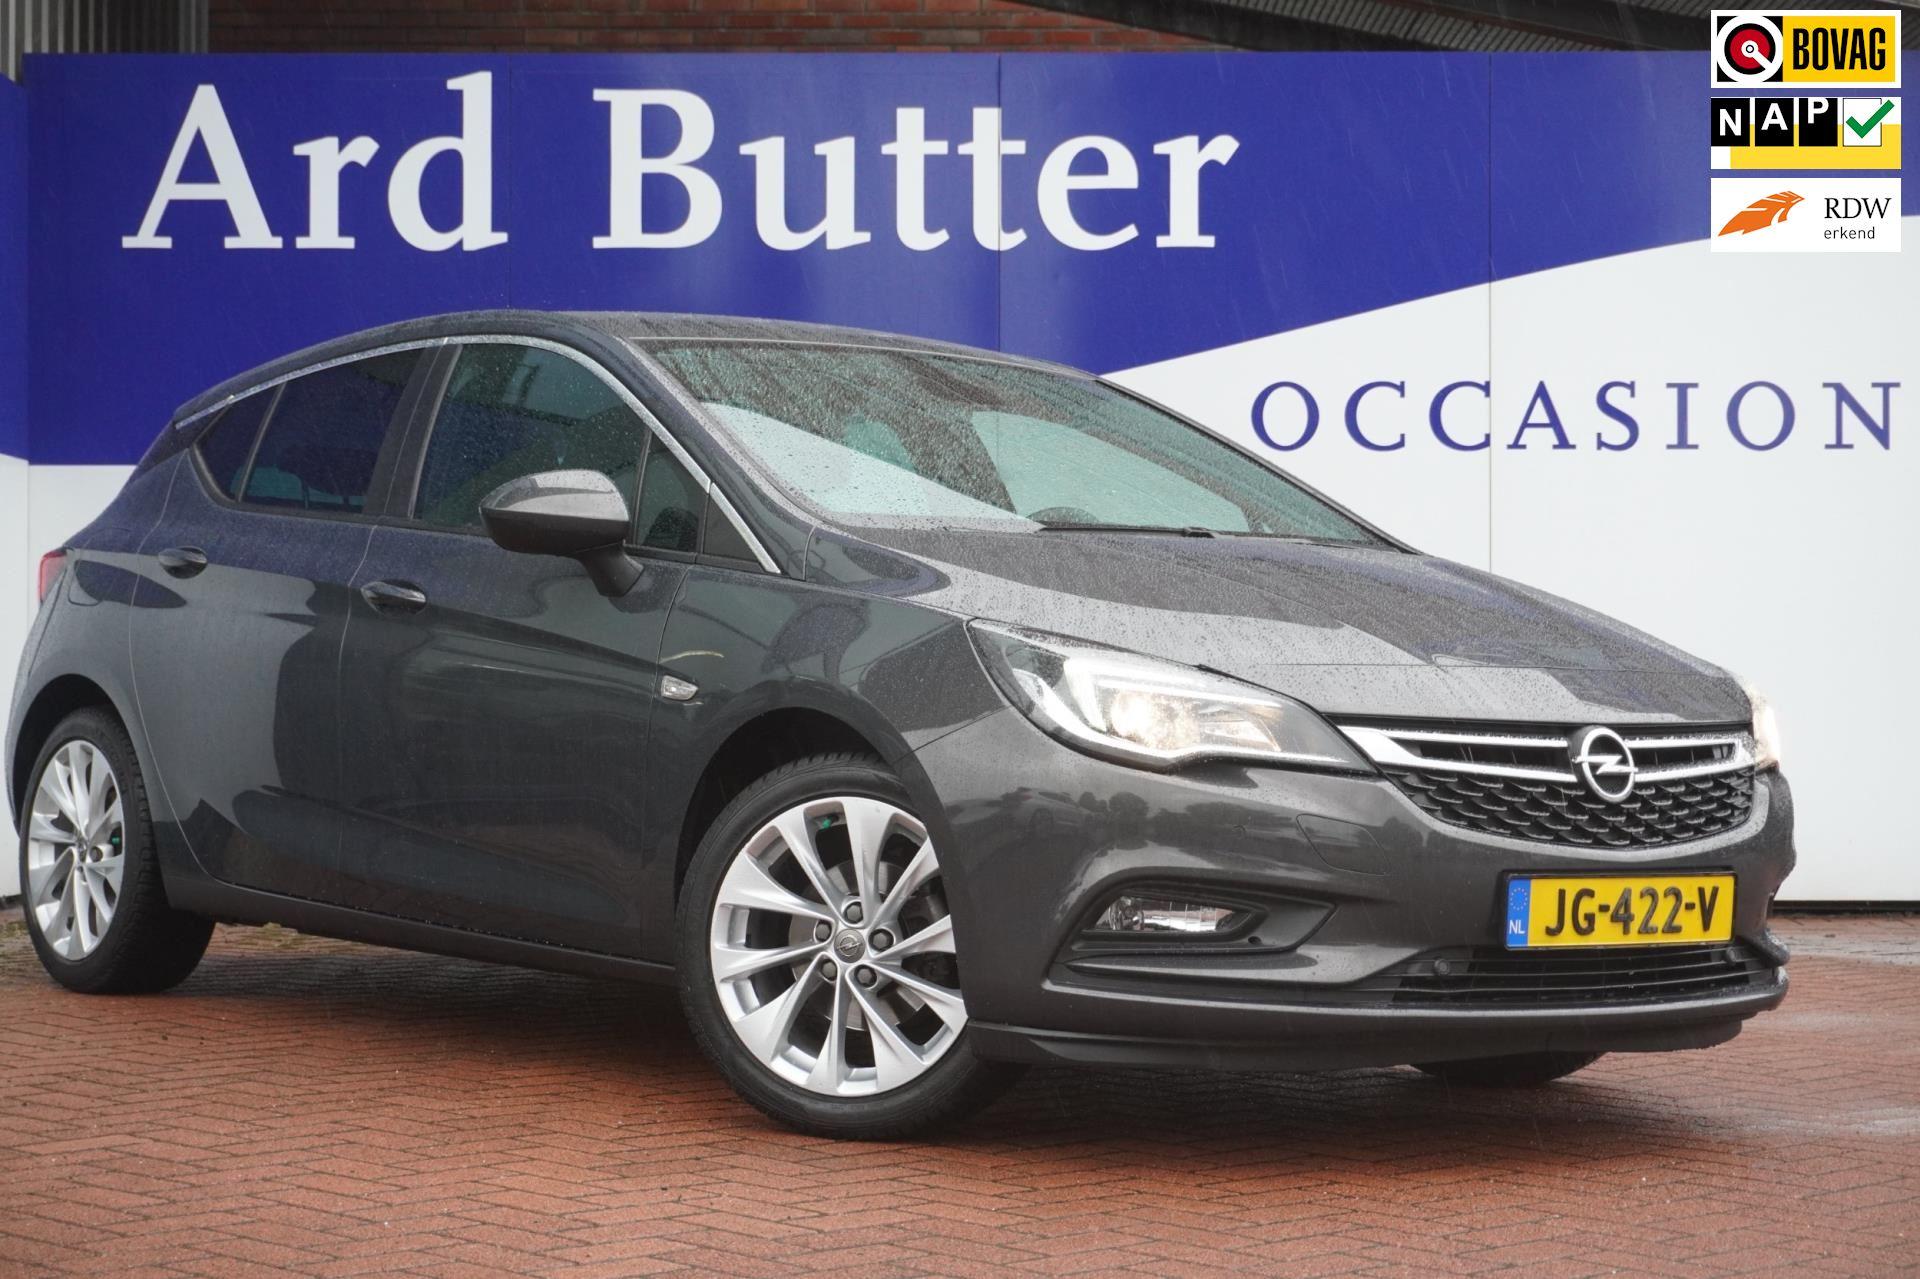 Opel Astra occasion - Autobedrijf Ard Butter B.V.